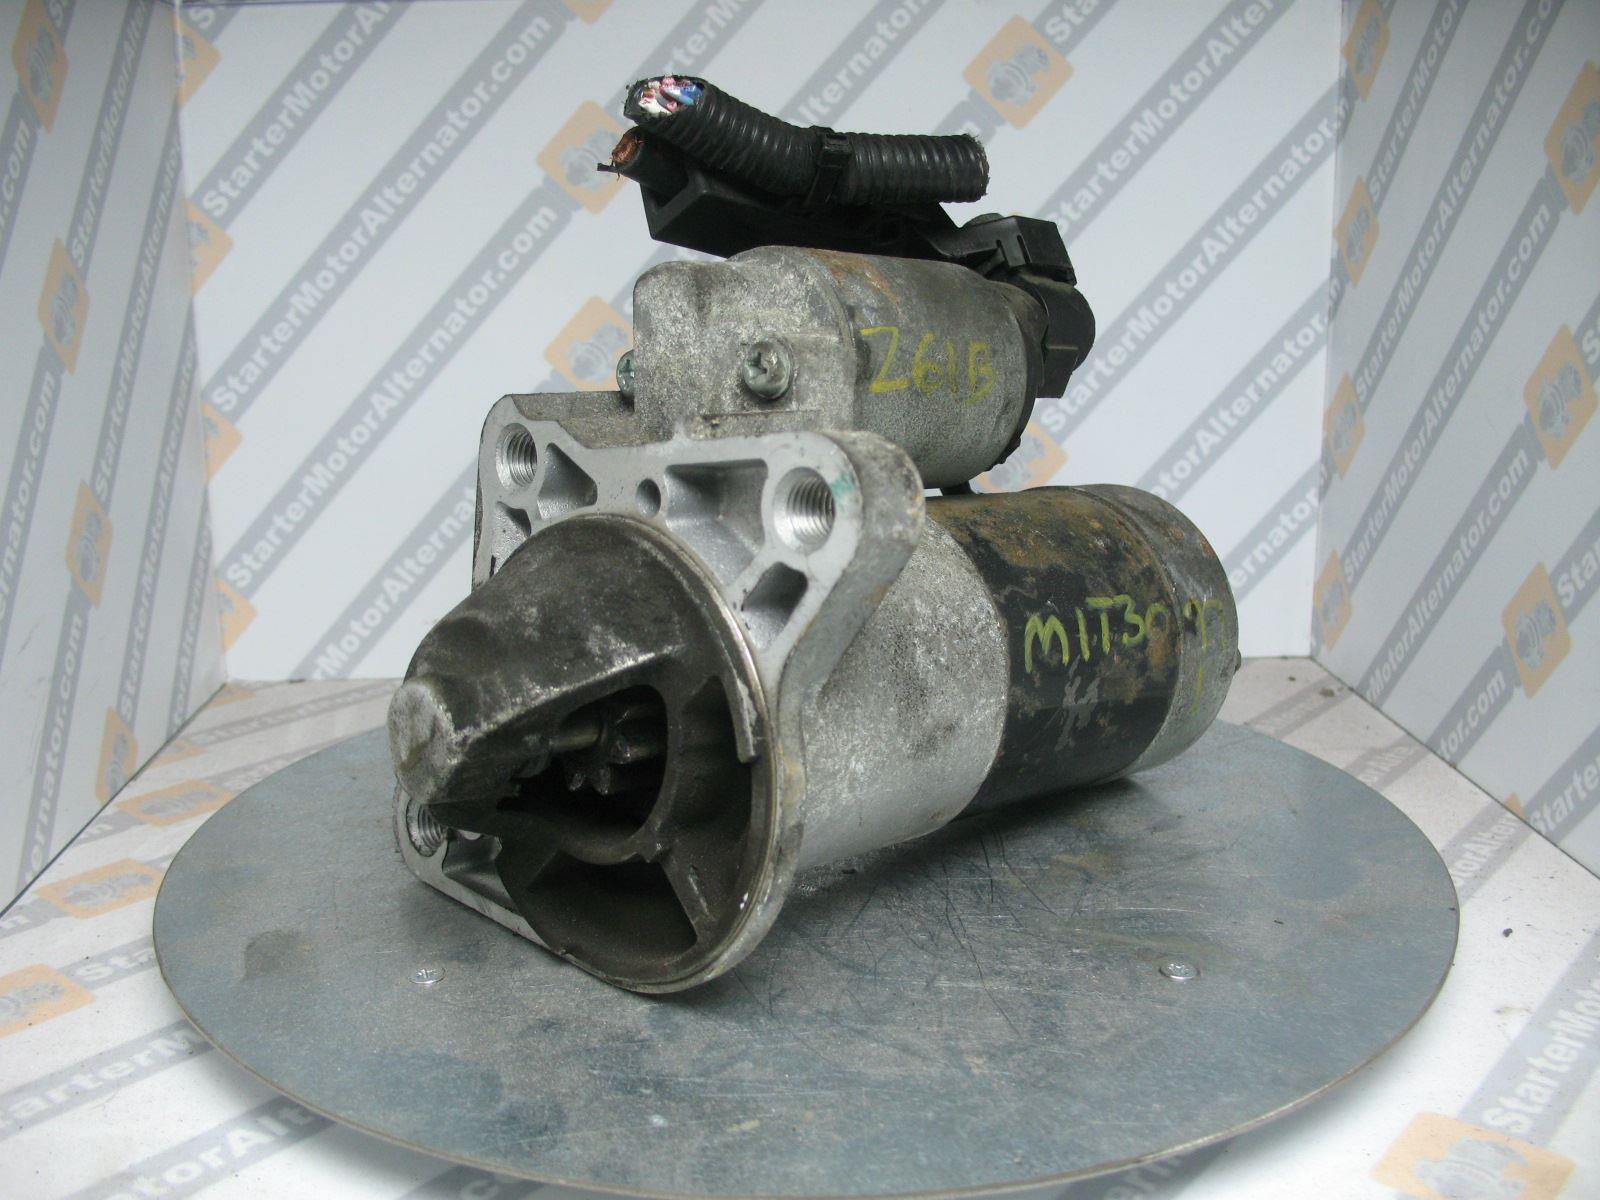 XIY2637 Starter Motor For Mazda